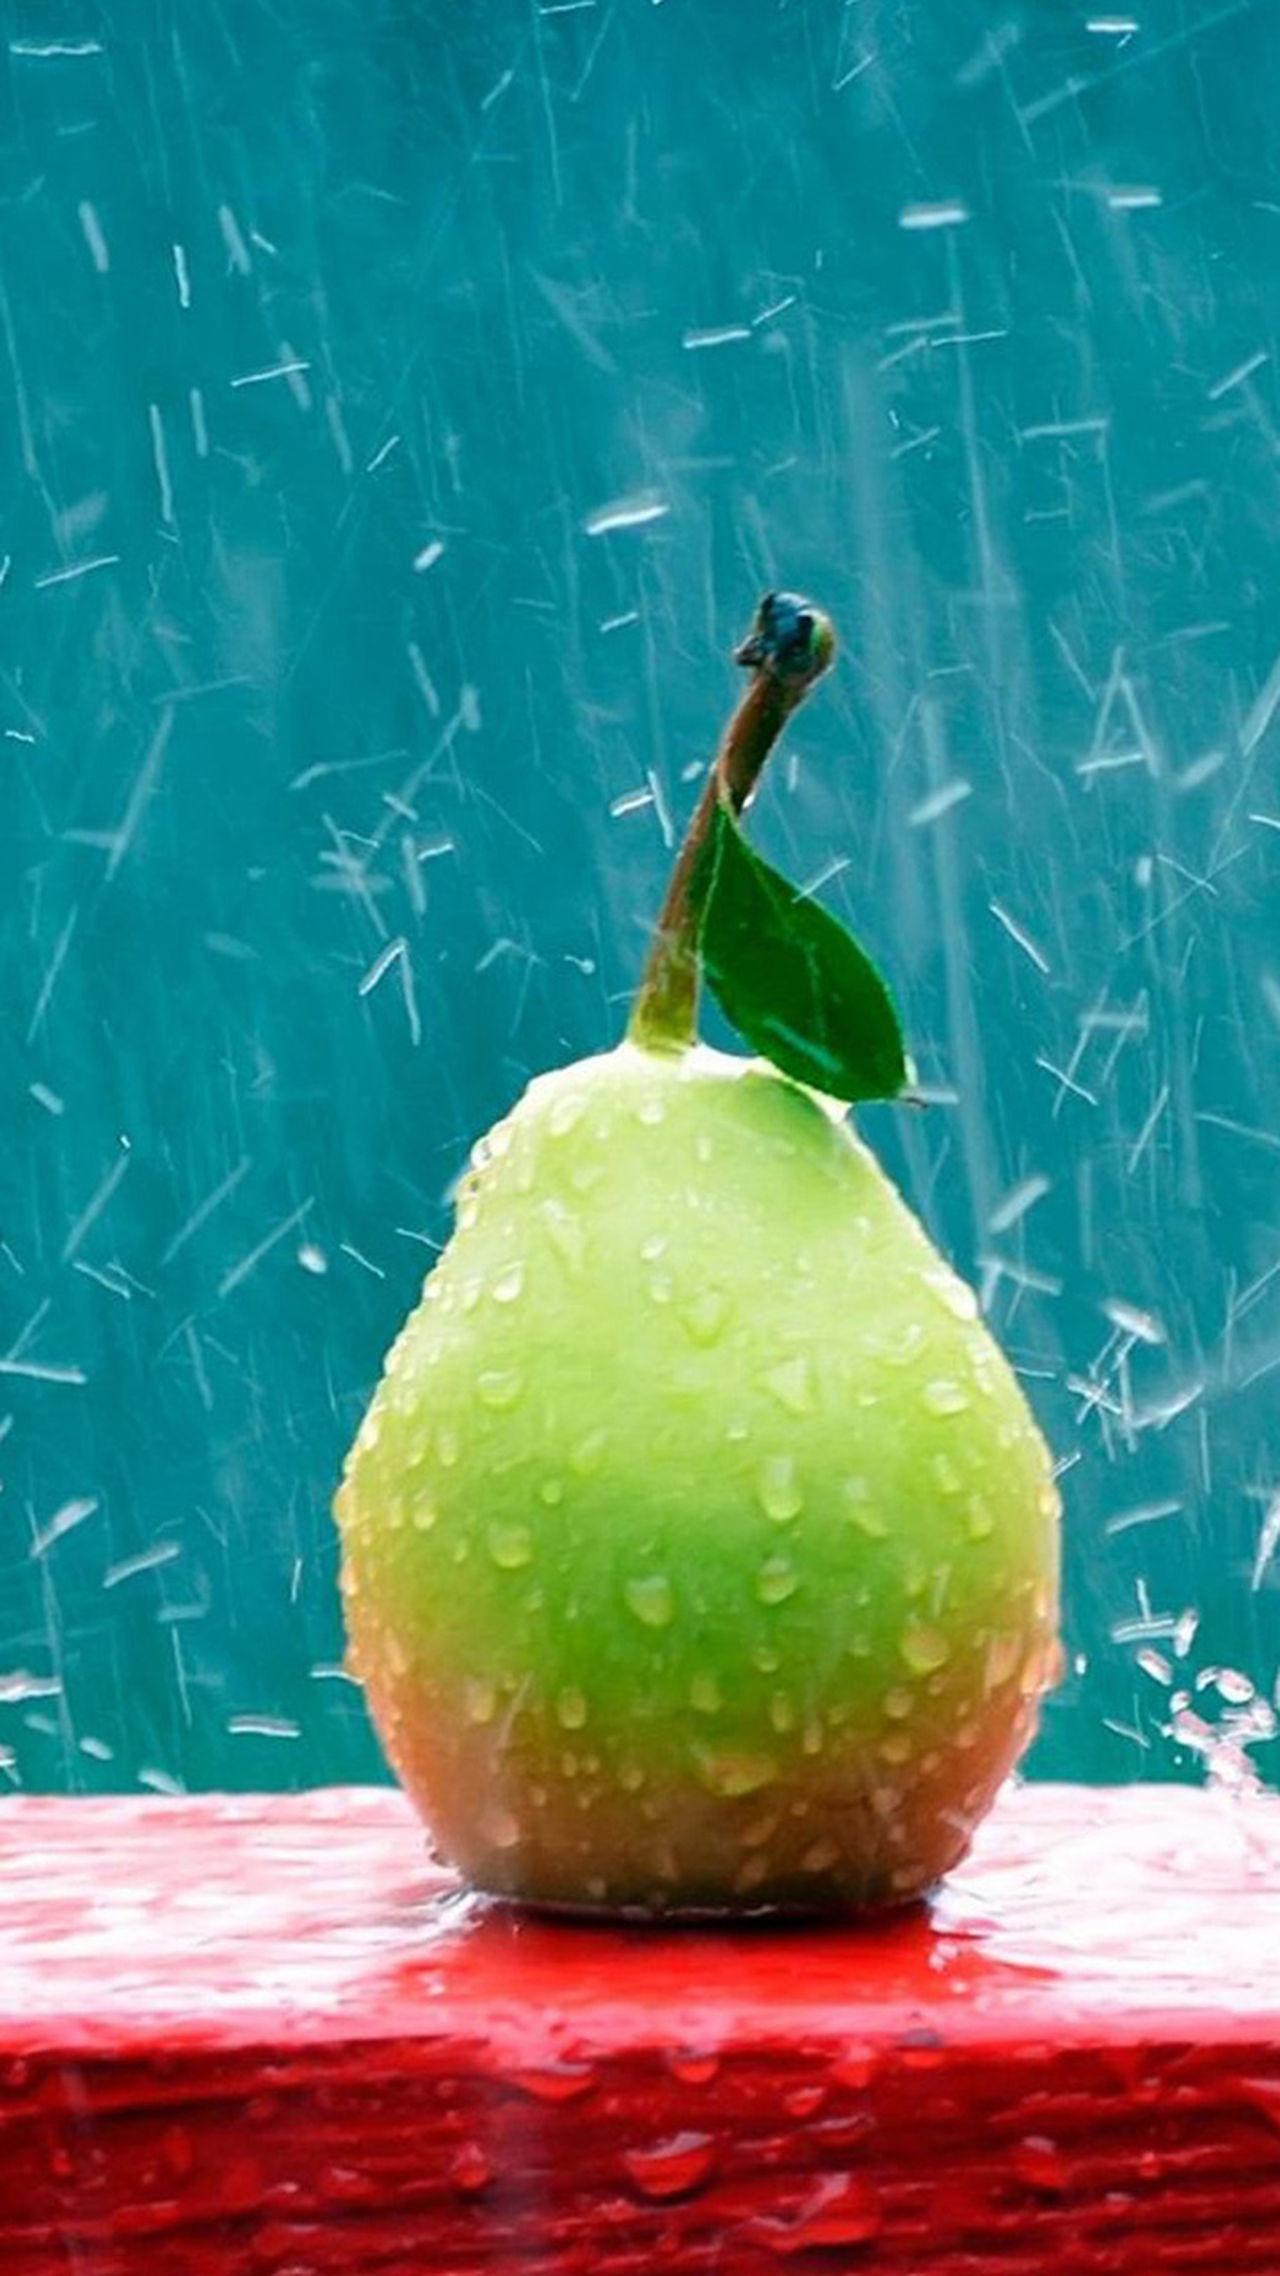 Food And Drink Healthy Eating Fruit Freshness Food Close-up Green Color Blue Organic Fresh Vibrant Color EyeEm Nature Lover Multi Colored Izmir/ Bornova EyeEmBestPics First Eyeem Photo